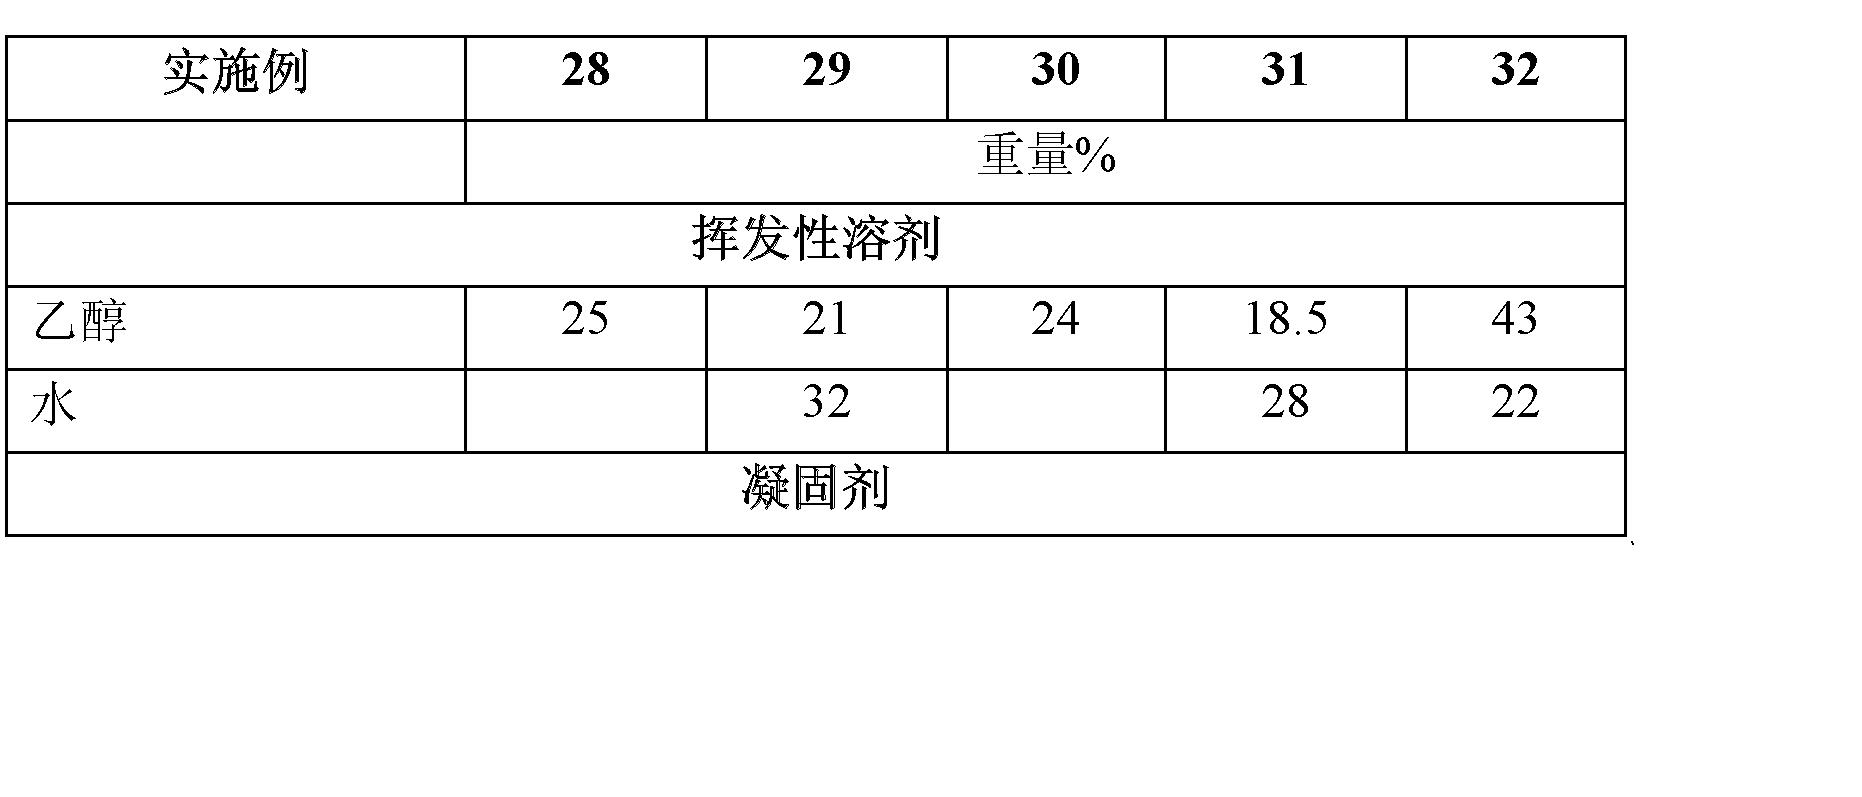 Figure CN102670567AD00362